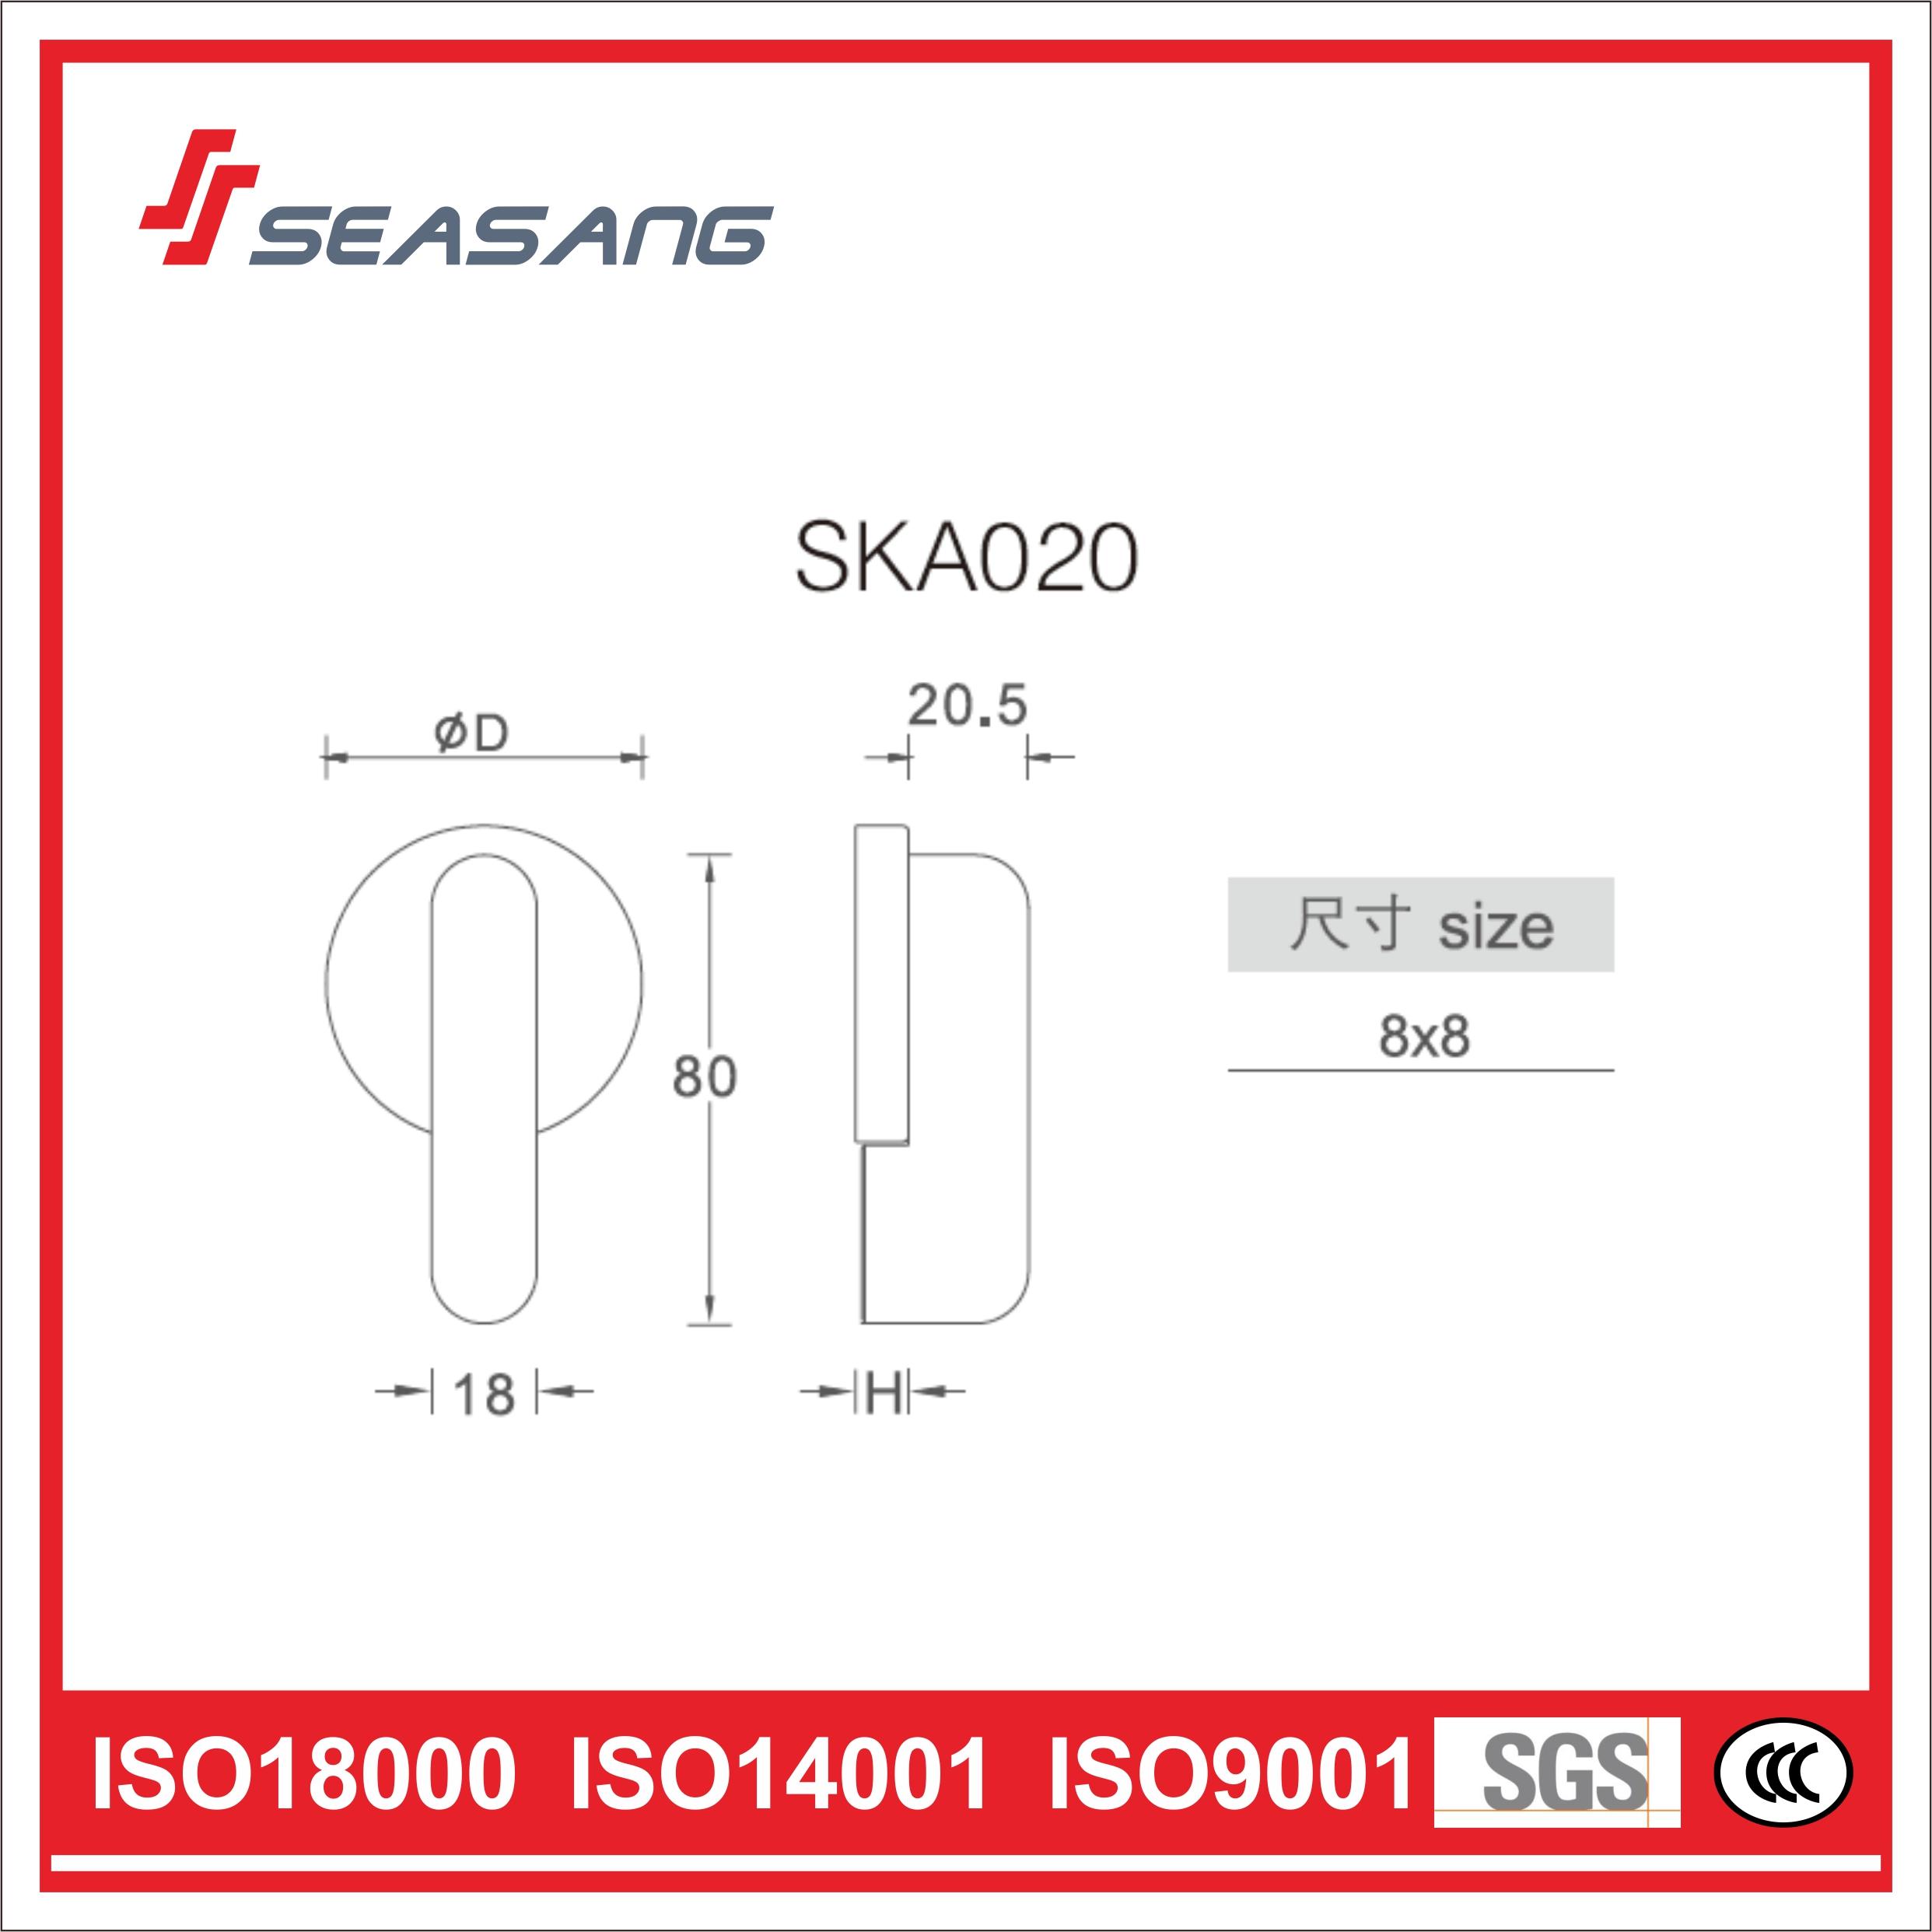 Stainless Steel Bathroom Handle Ska020